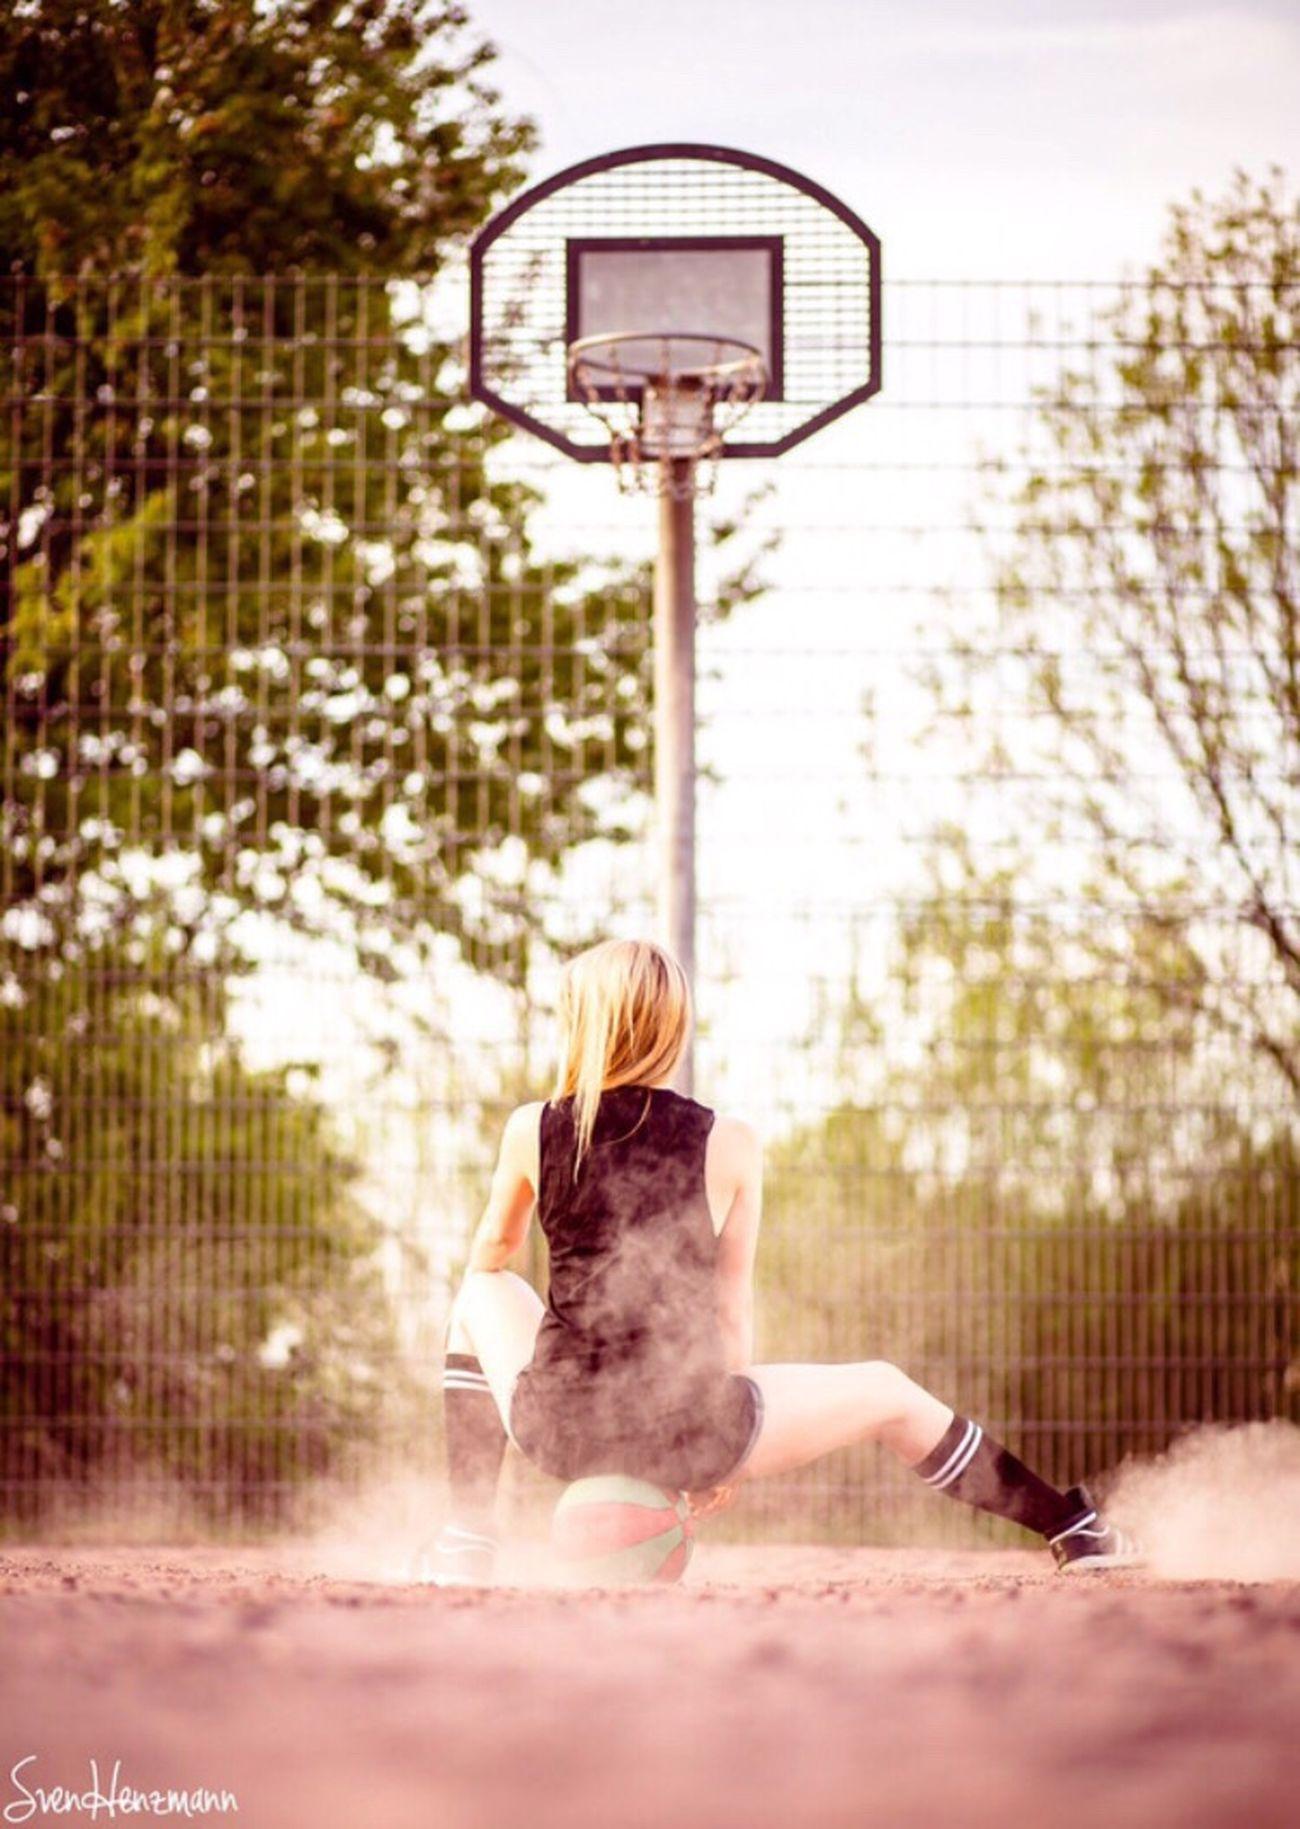 Me Girl Sport Basketball Basketballkorb Fotoshooting Blond Sportoutfit Spaß Outdoorshooting